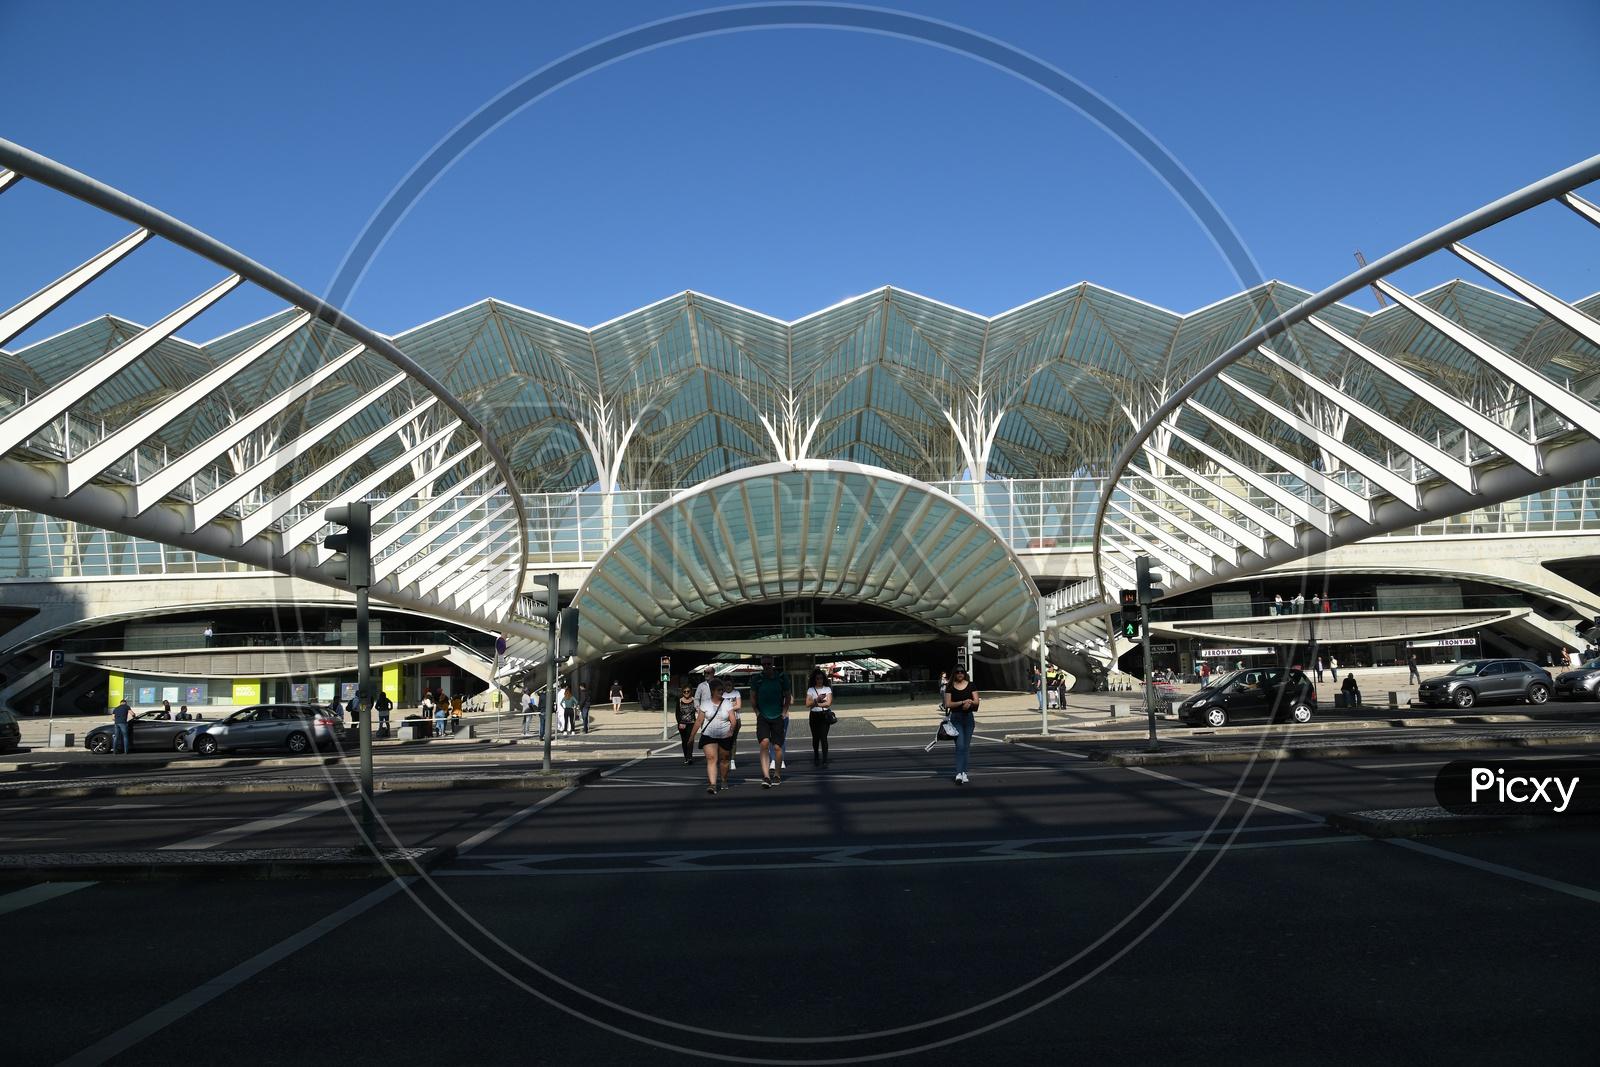 Gare Do Oriente Or The Lisbon Oriente Station  Is The Main Portuguese Intermodal Transport Hubs In Lisbon